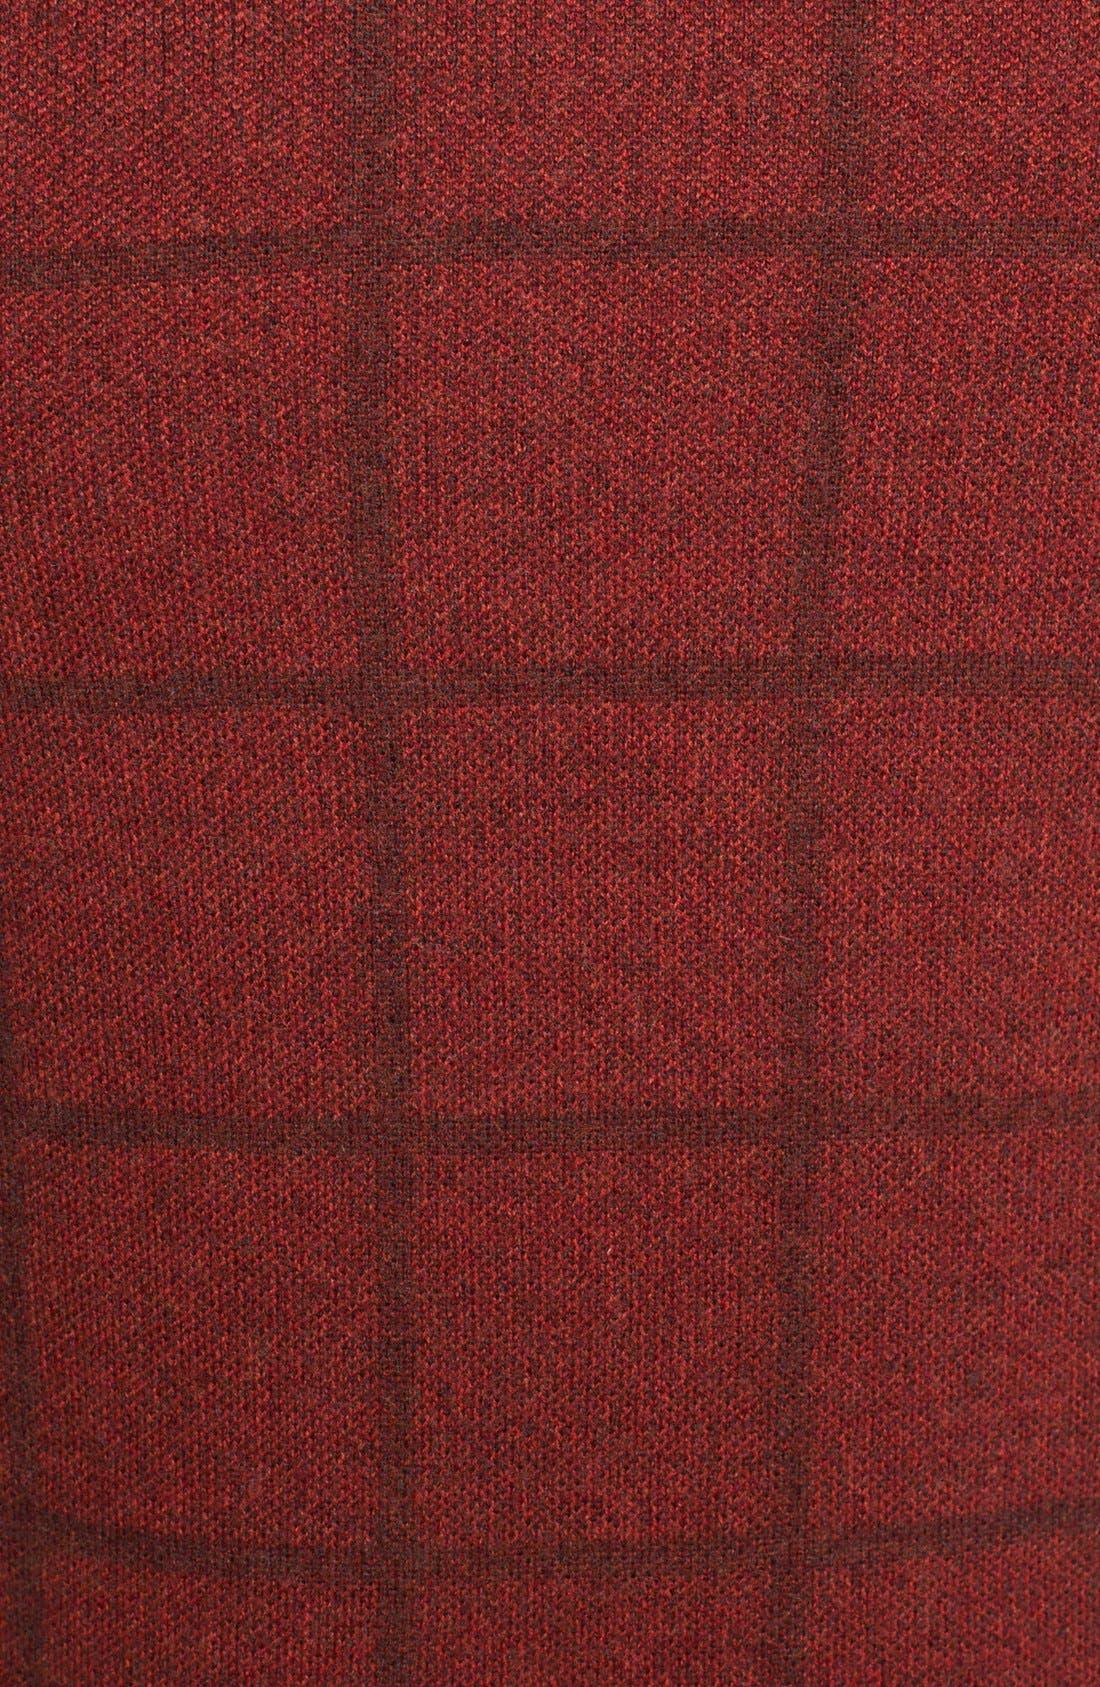 Alternate Image 3  - J. Press York Street Windowpane Merino Wool Crewneck Sweater